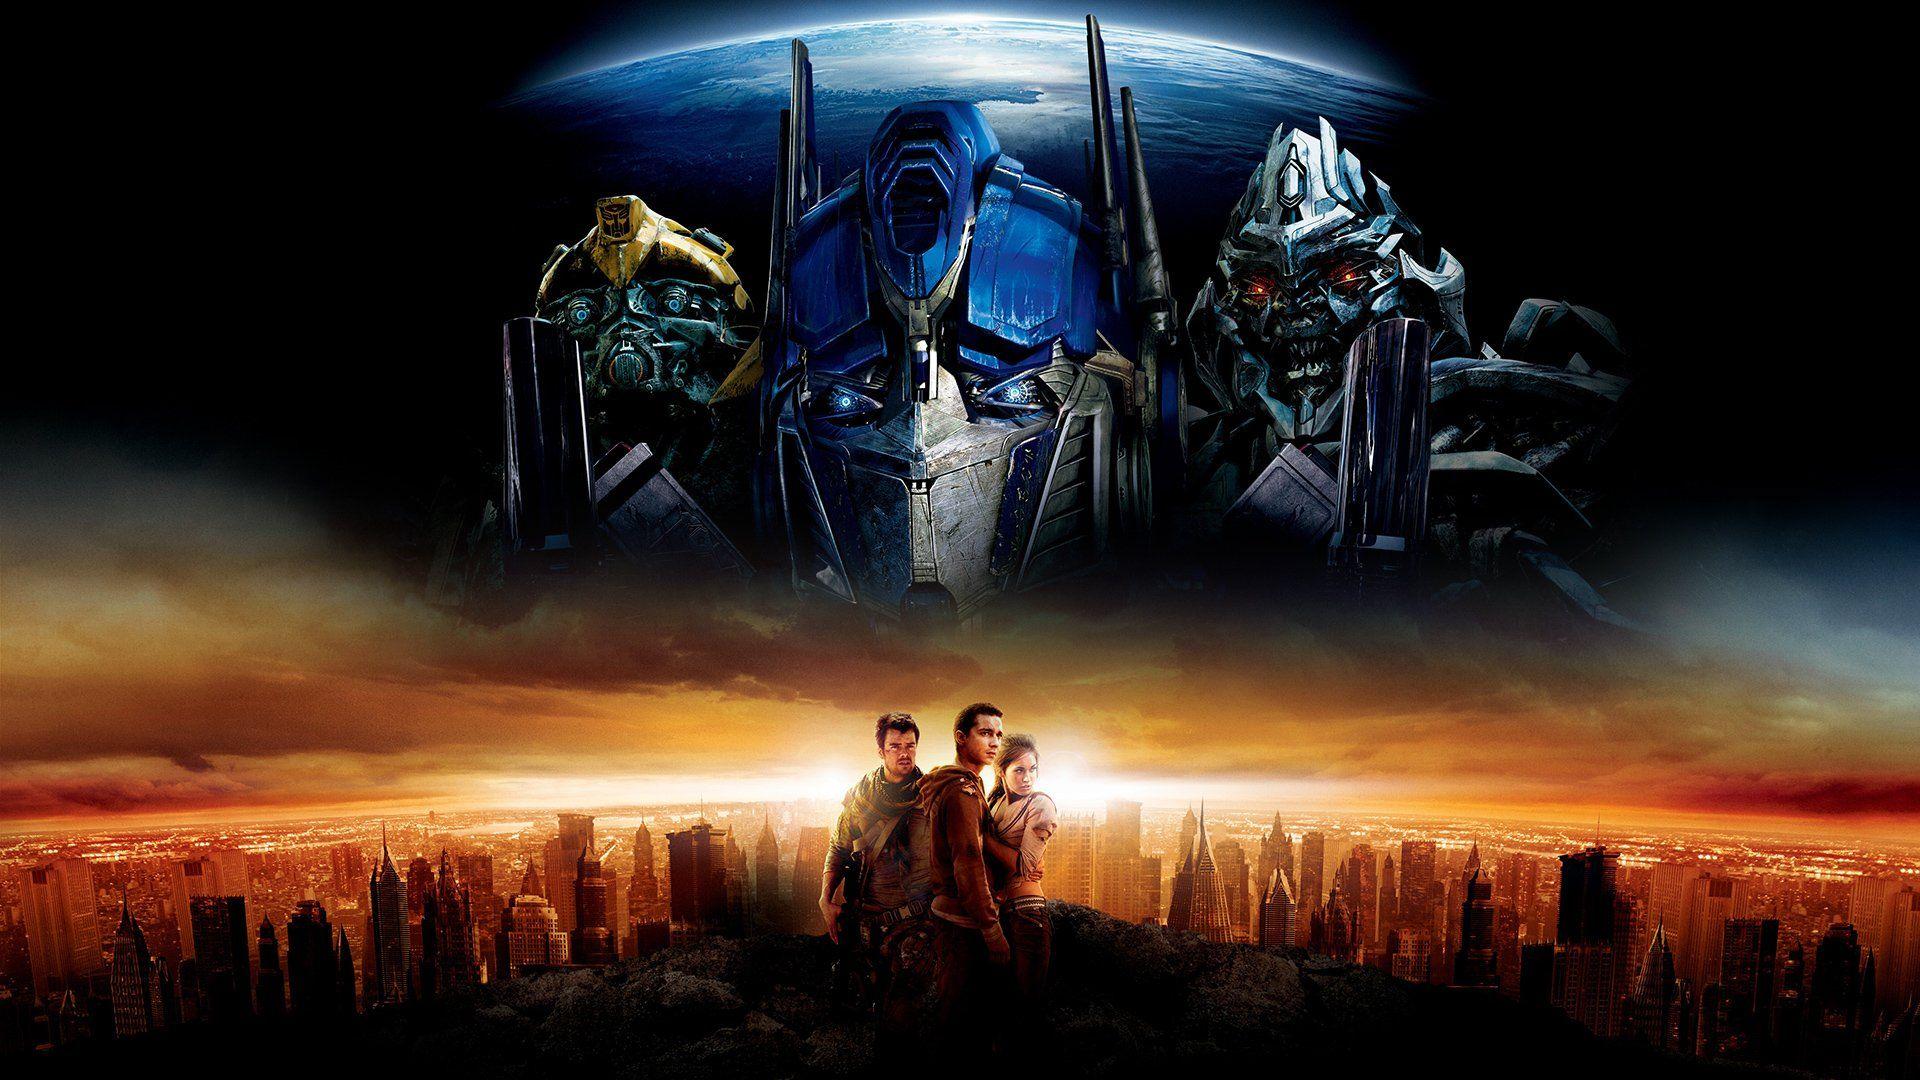 Movie Transformers Wallpaper Transformers movie Transformers 1920x1080